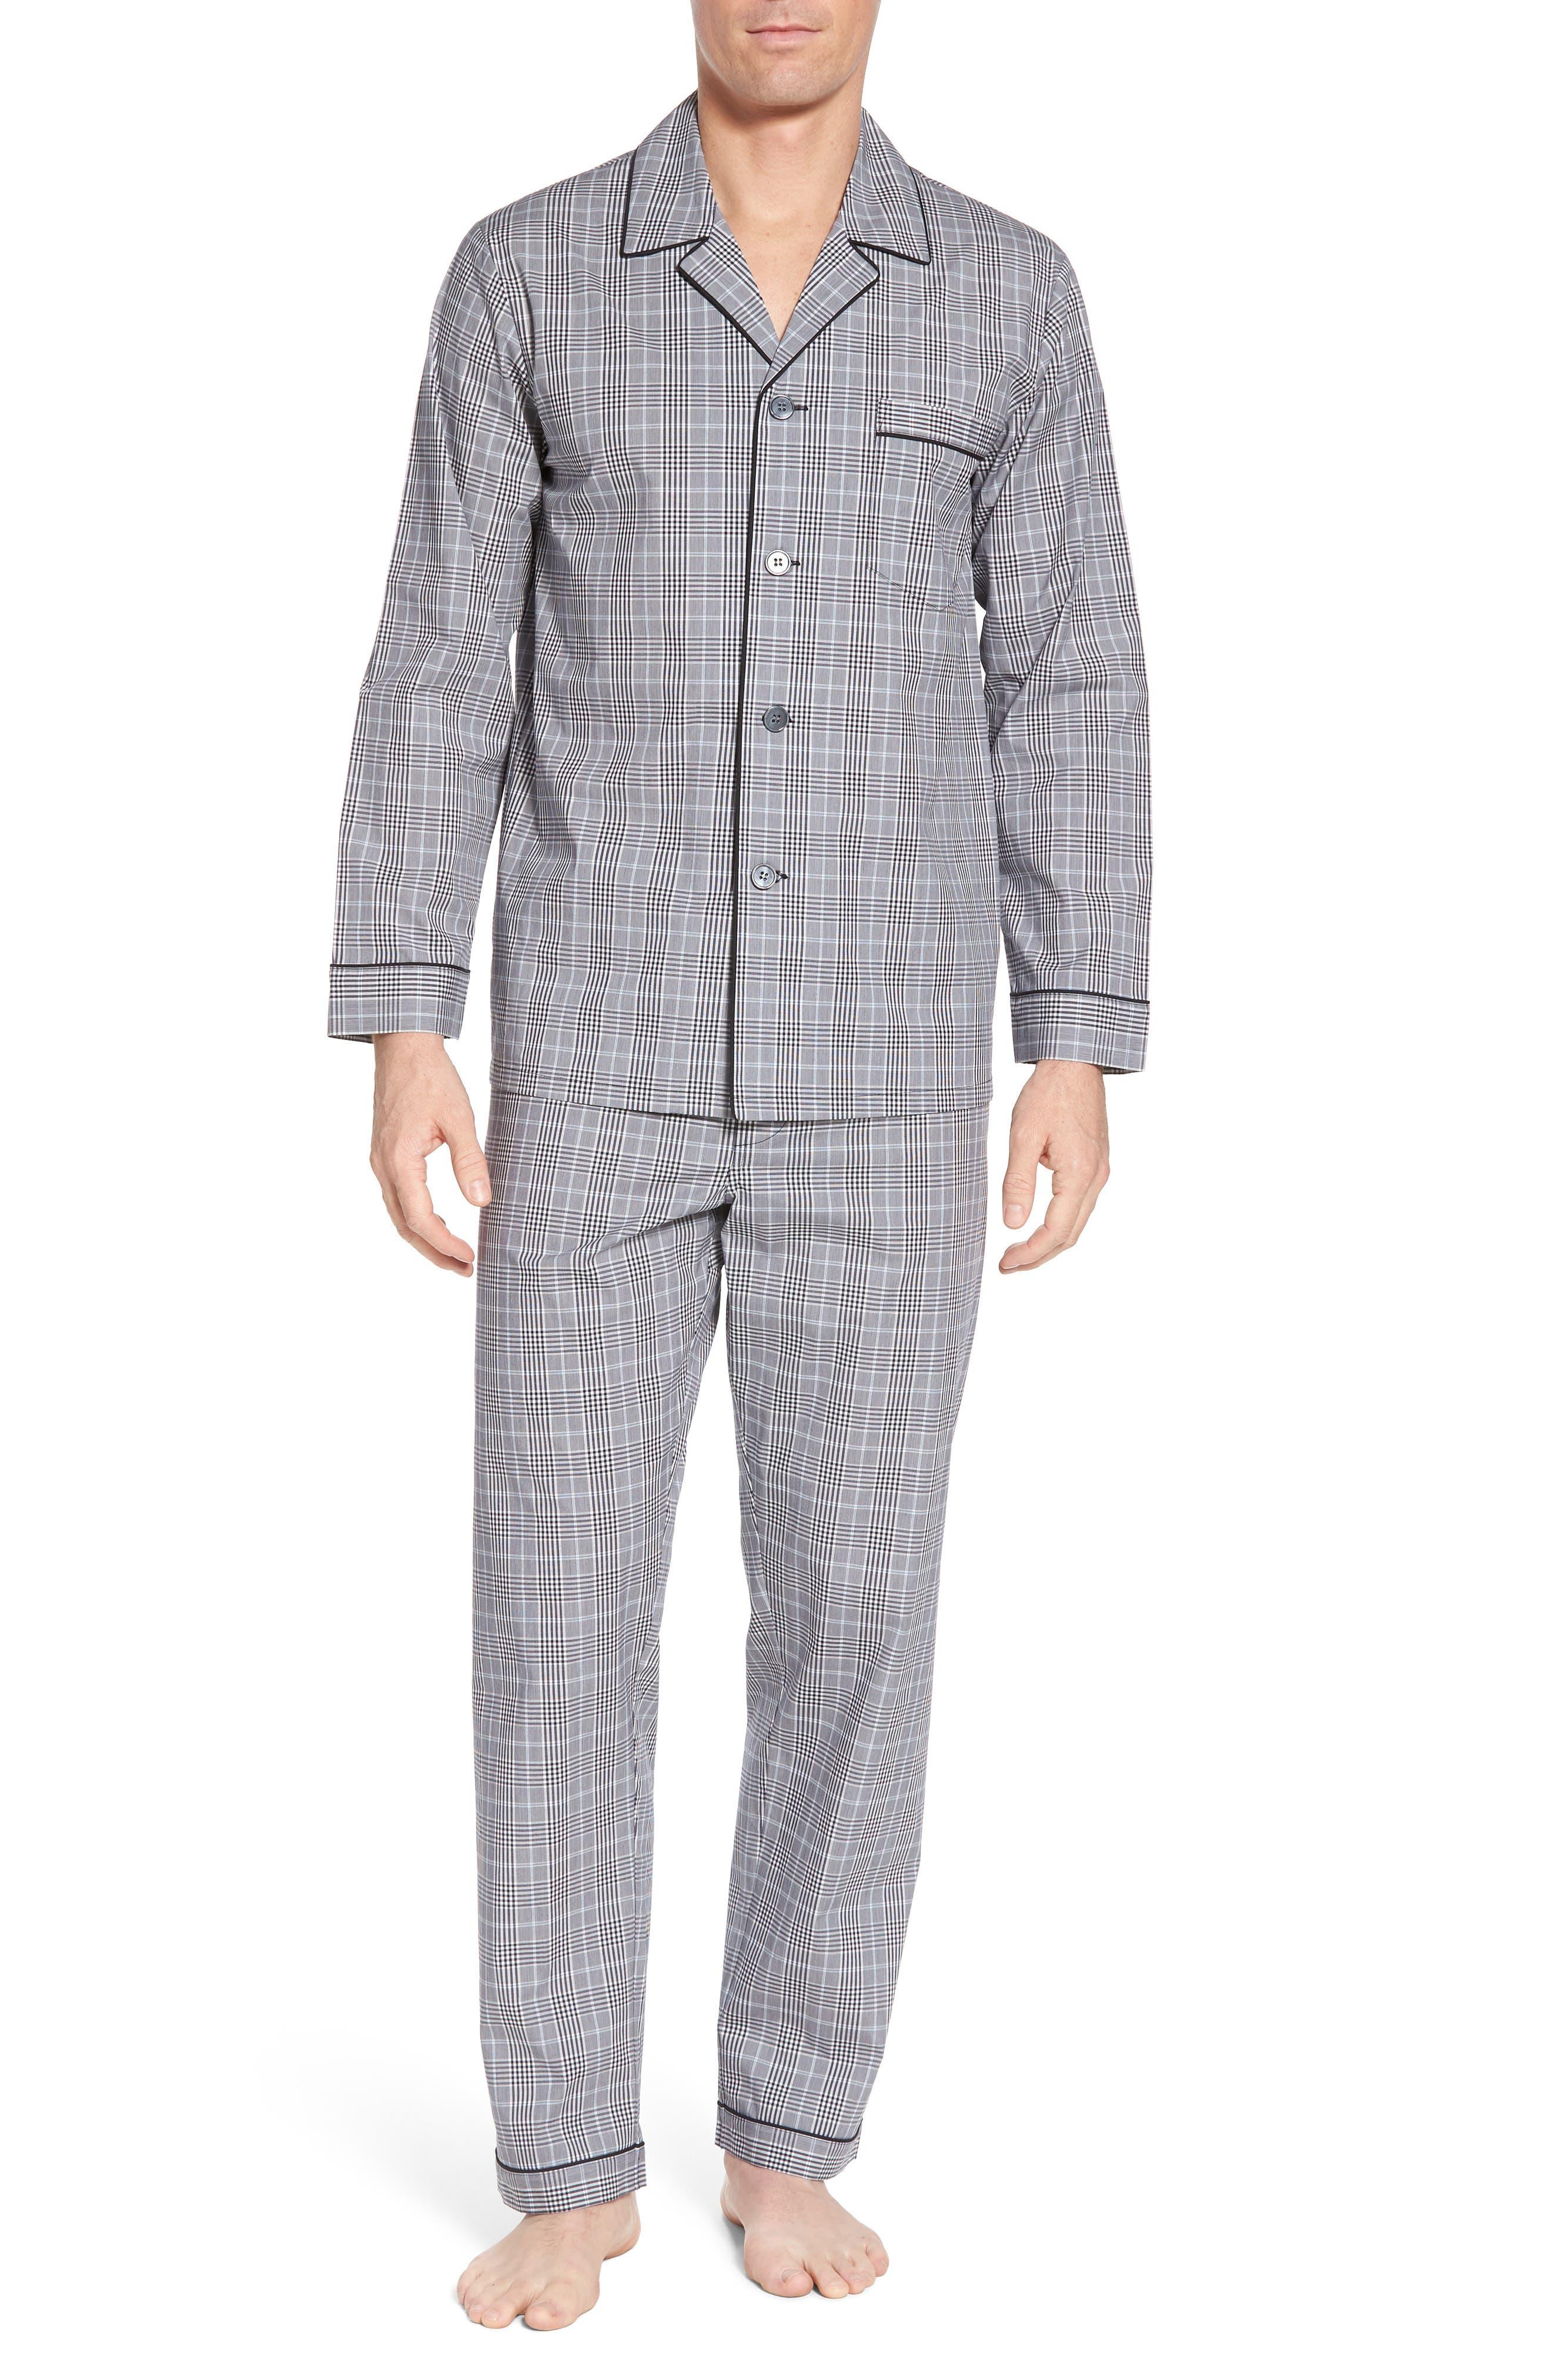 Charleston Pajama Set,                             Main thumbnail 1, color,                             Black Plaid